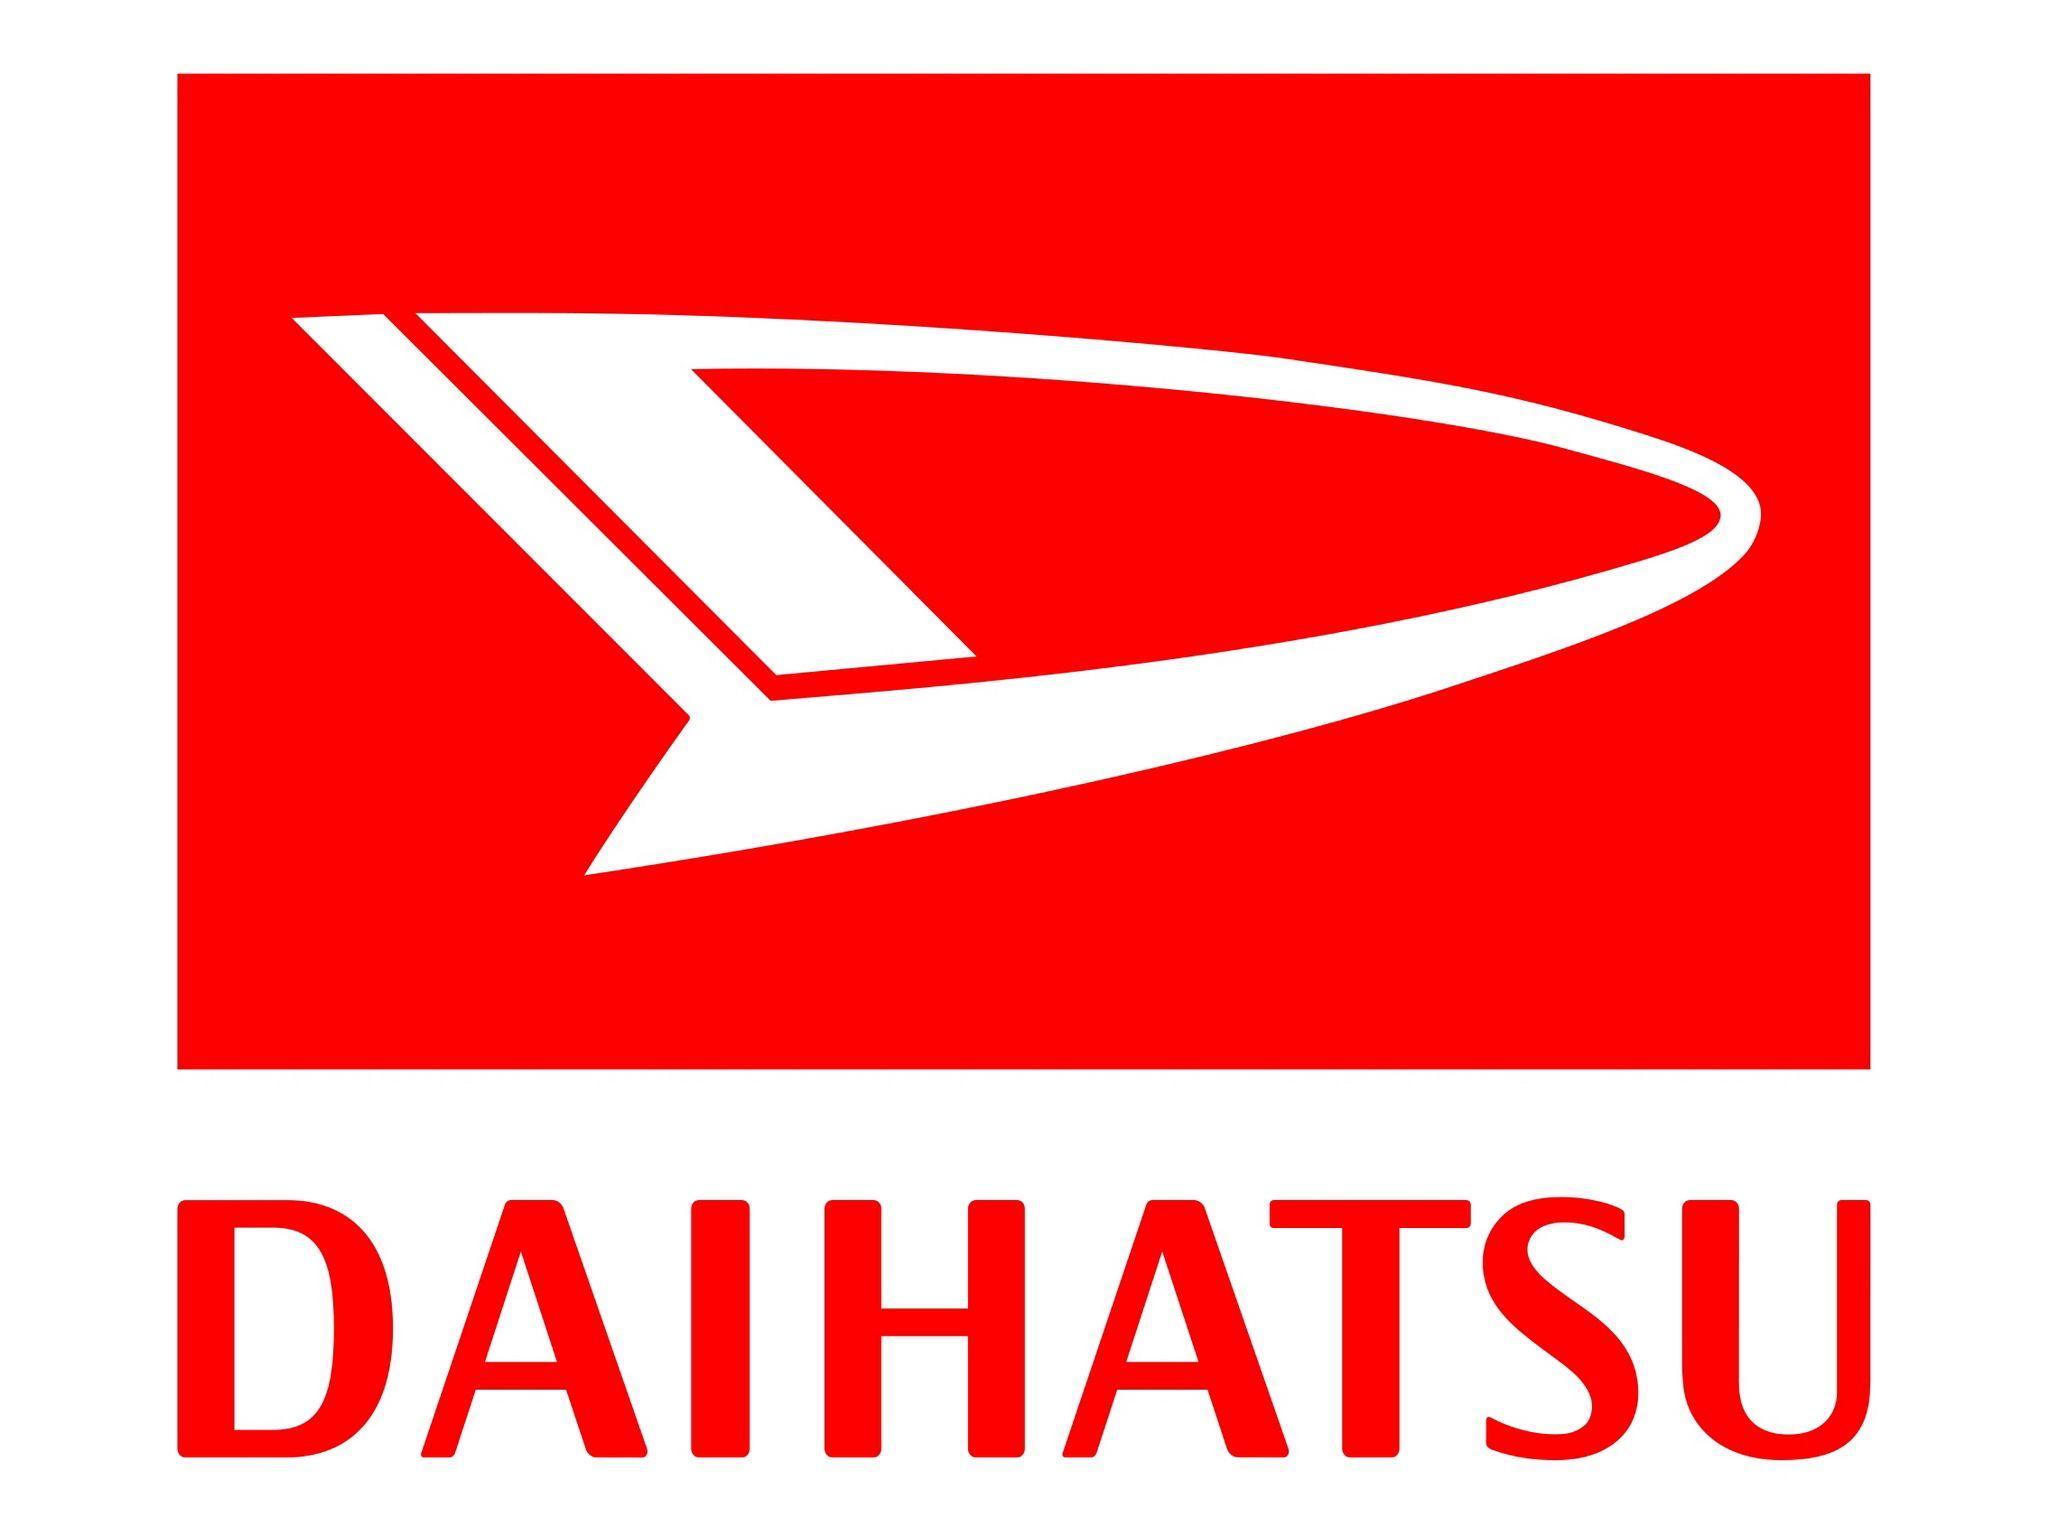 Daihatsu All Car Logos in 2018 Pinterest